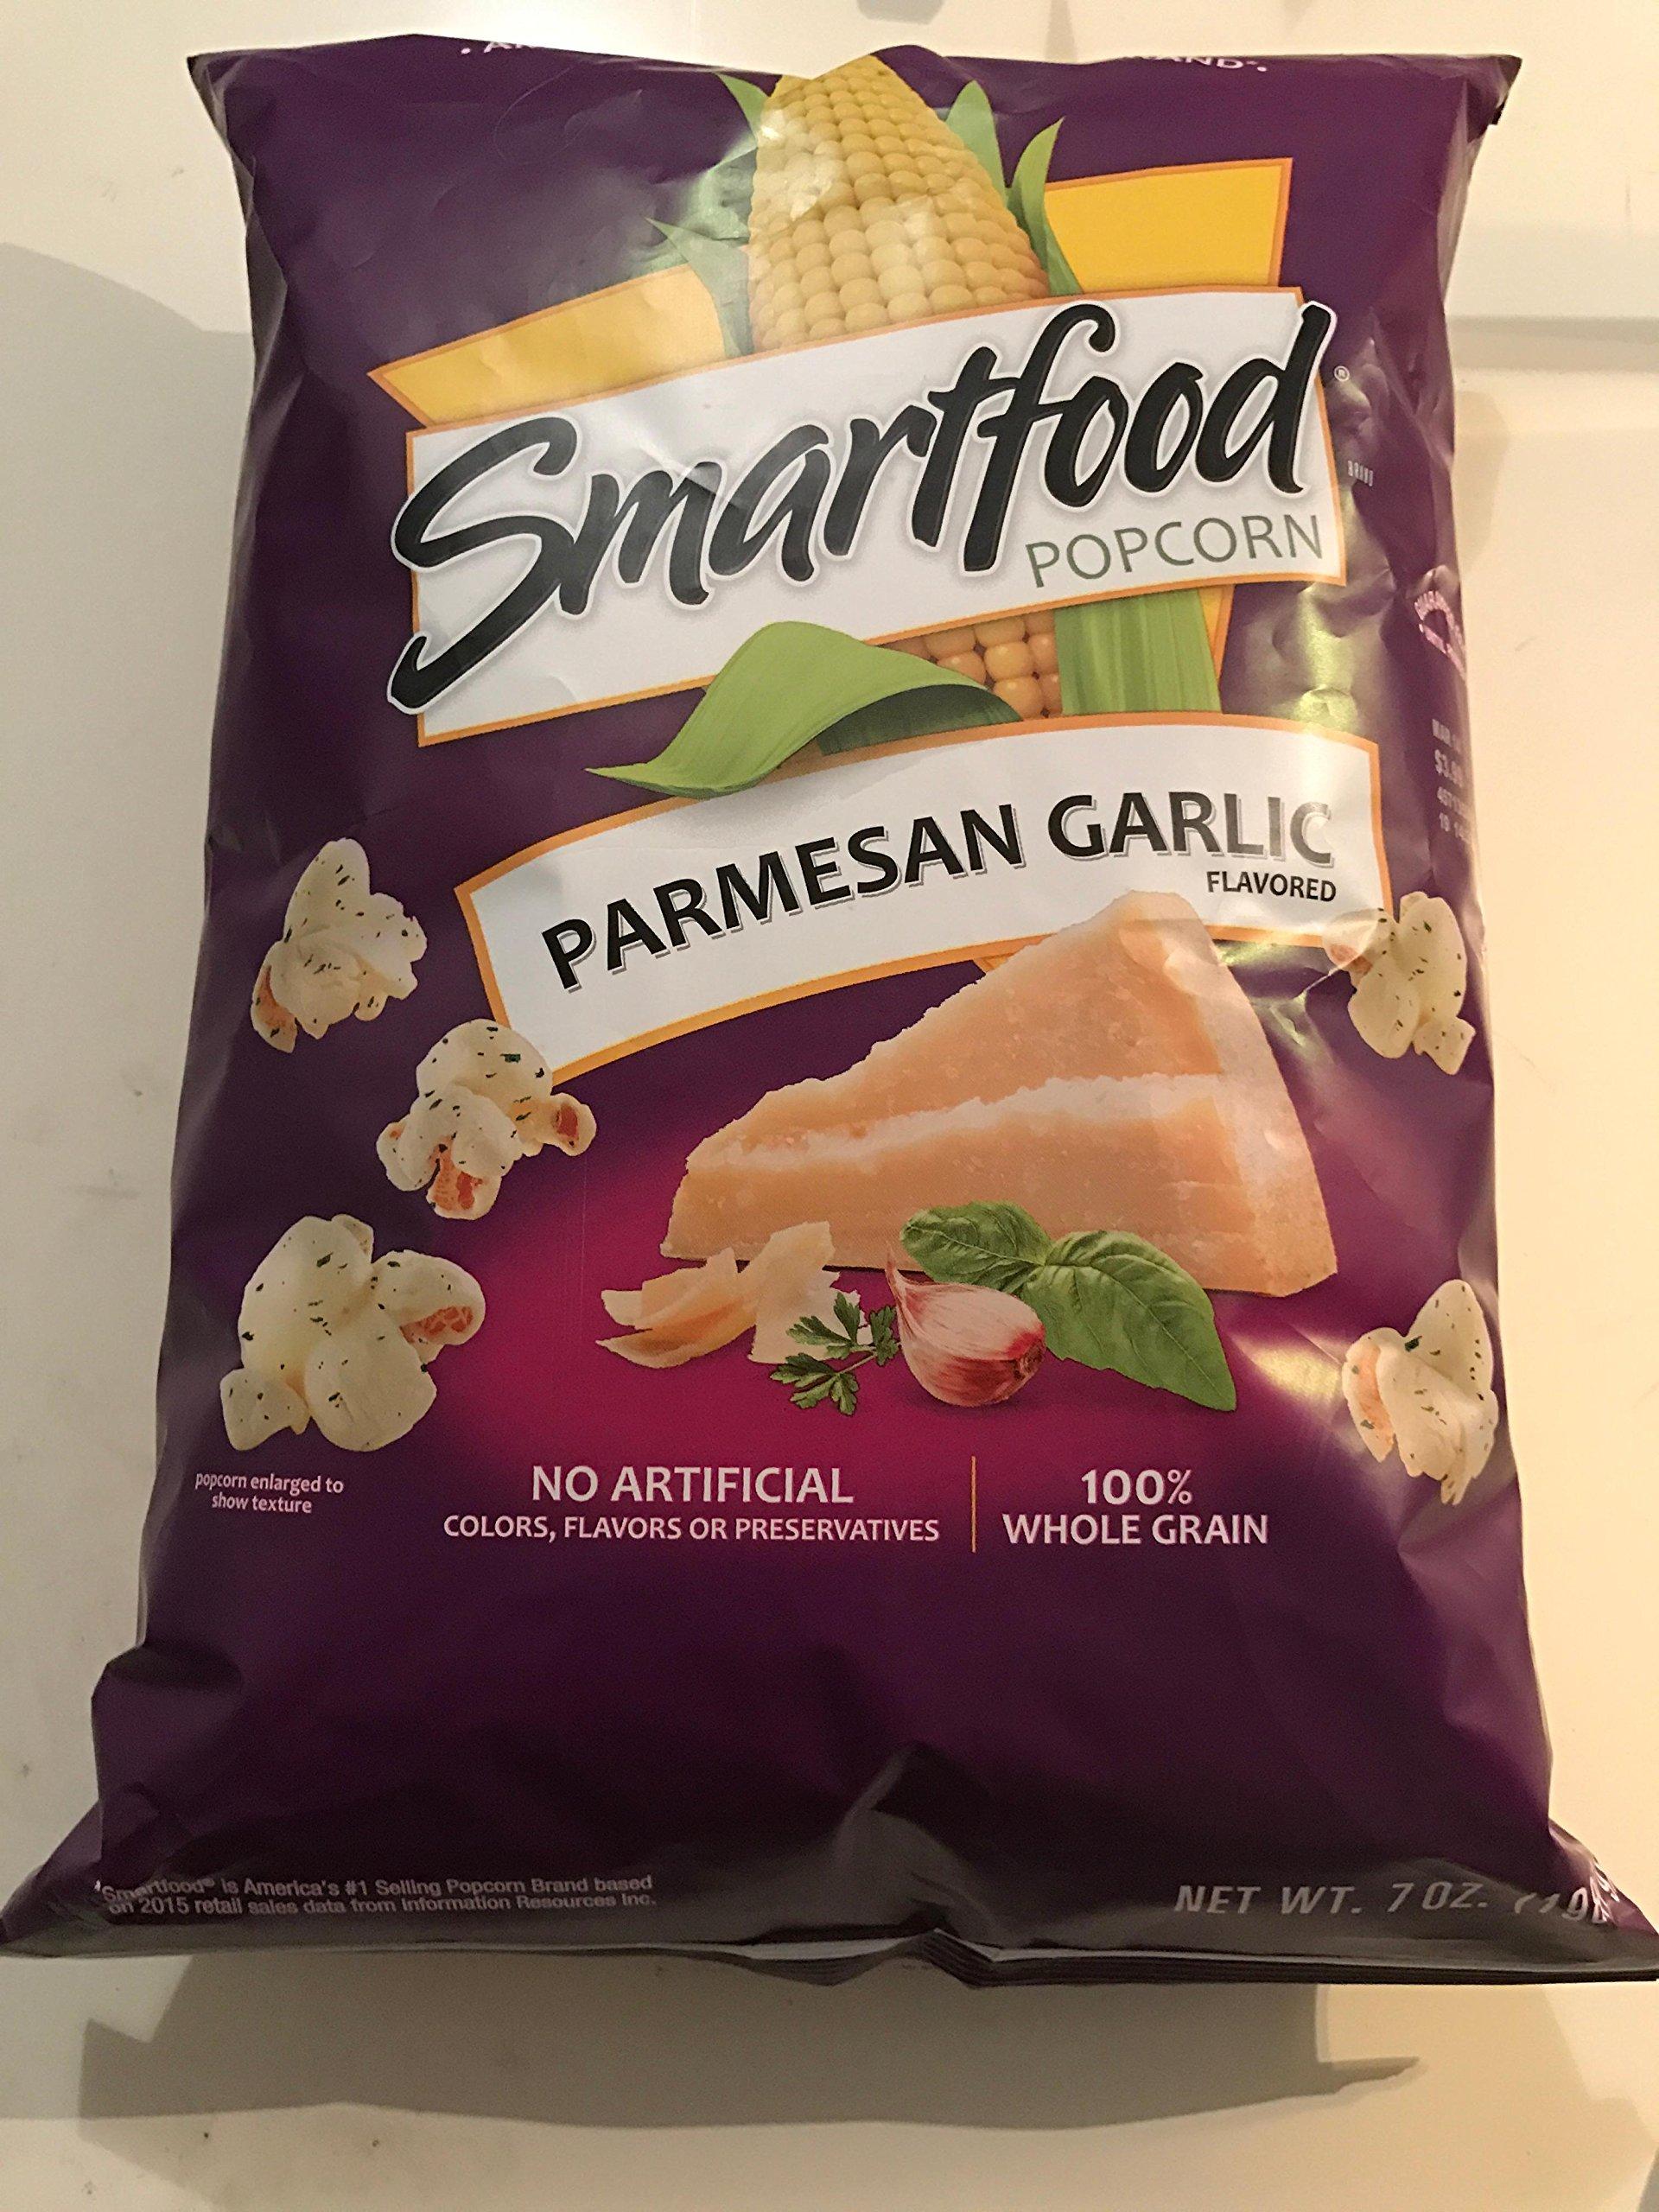 Smartfood Parmesan and Garlic Flavored Popcorn, 7 Ounce by Smartfood